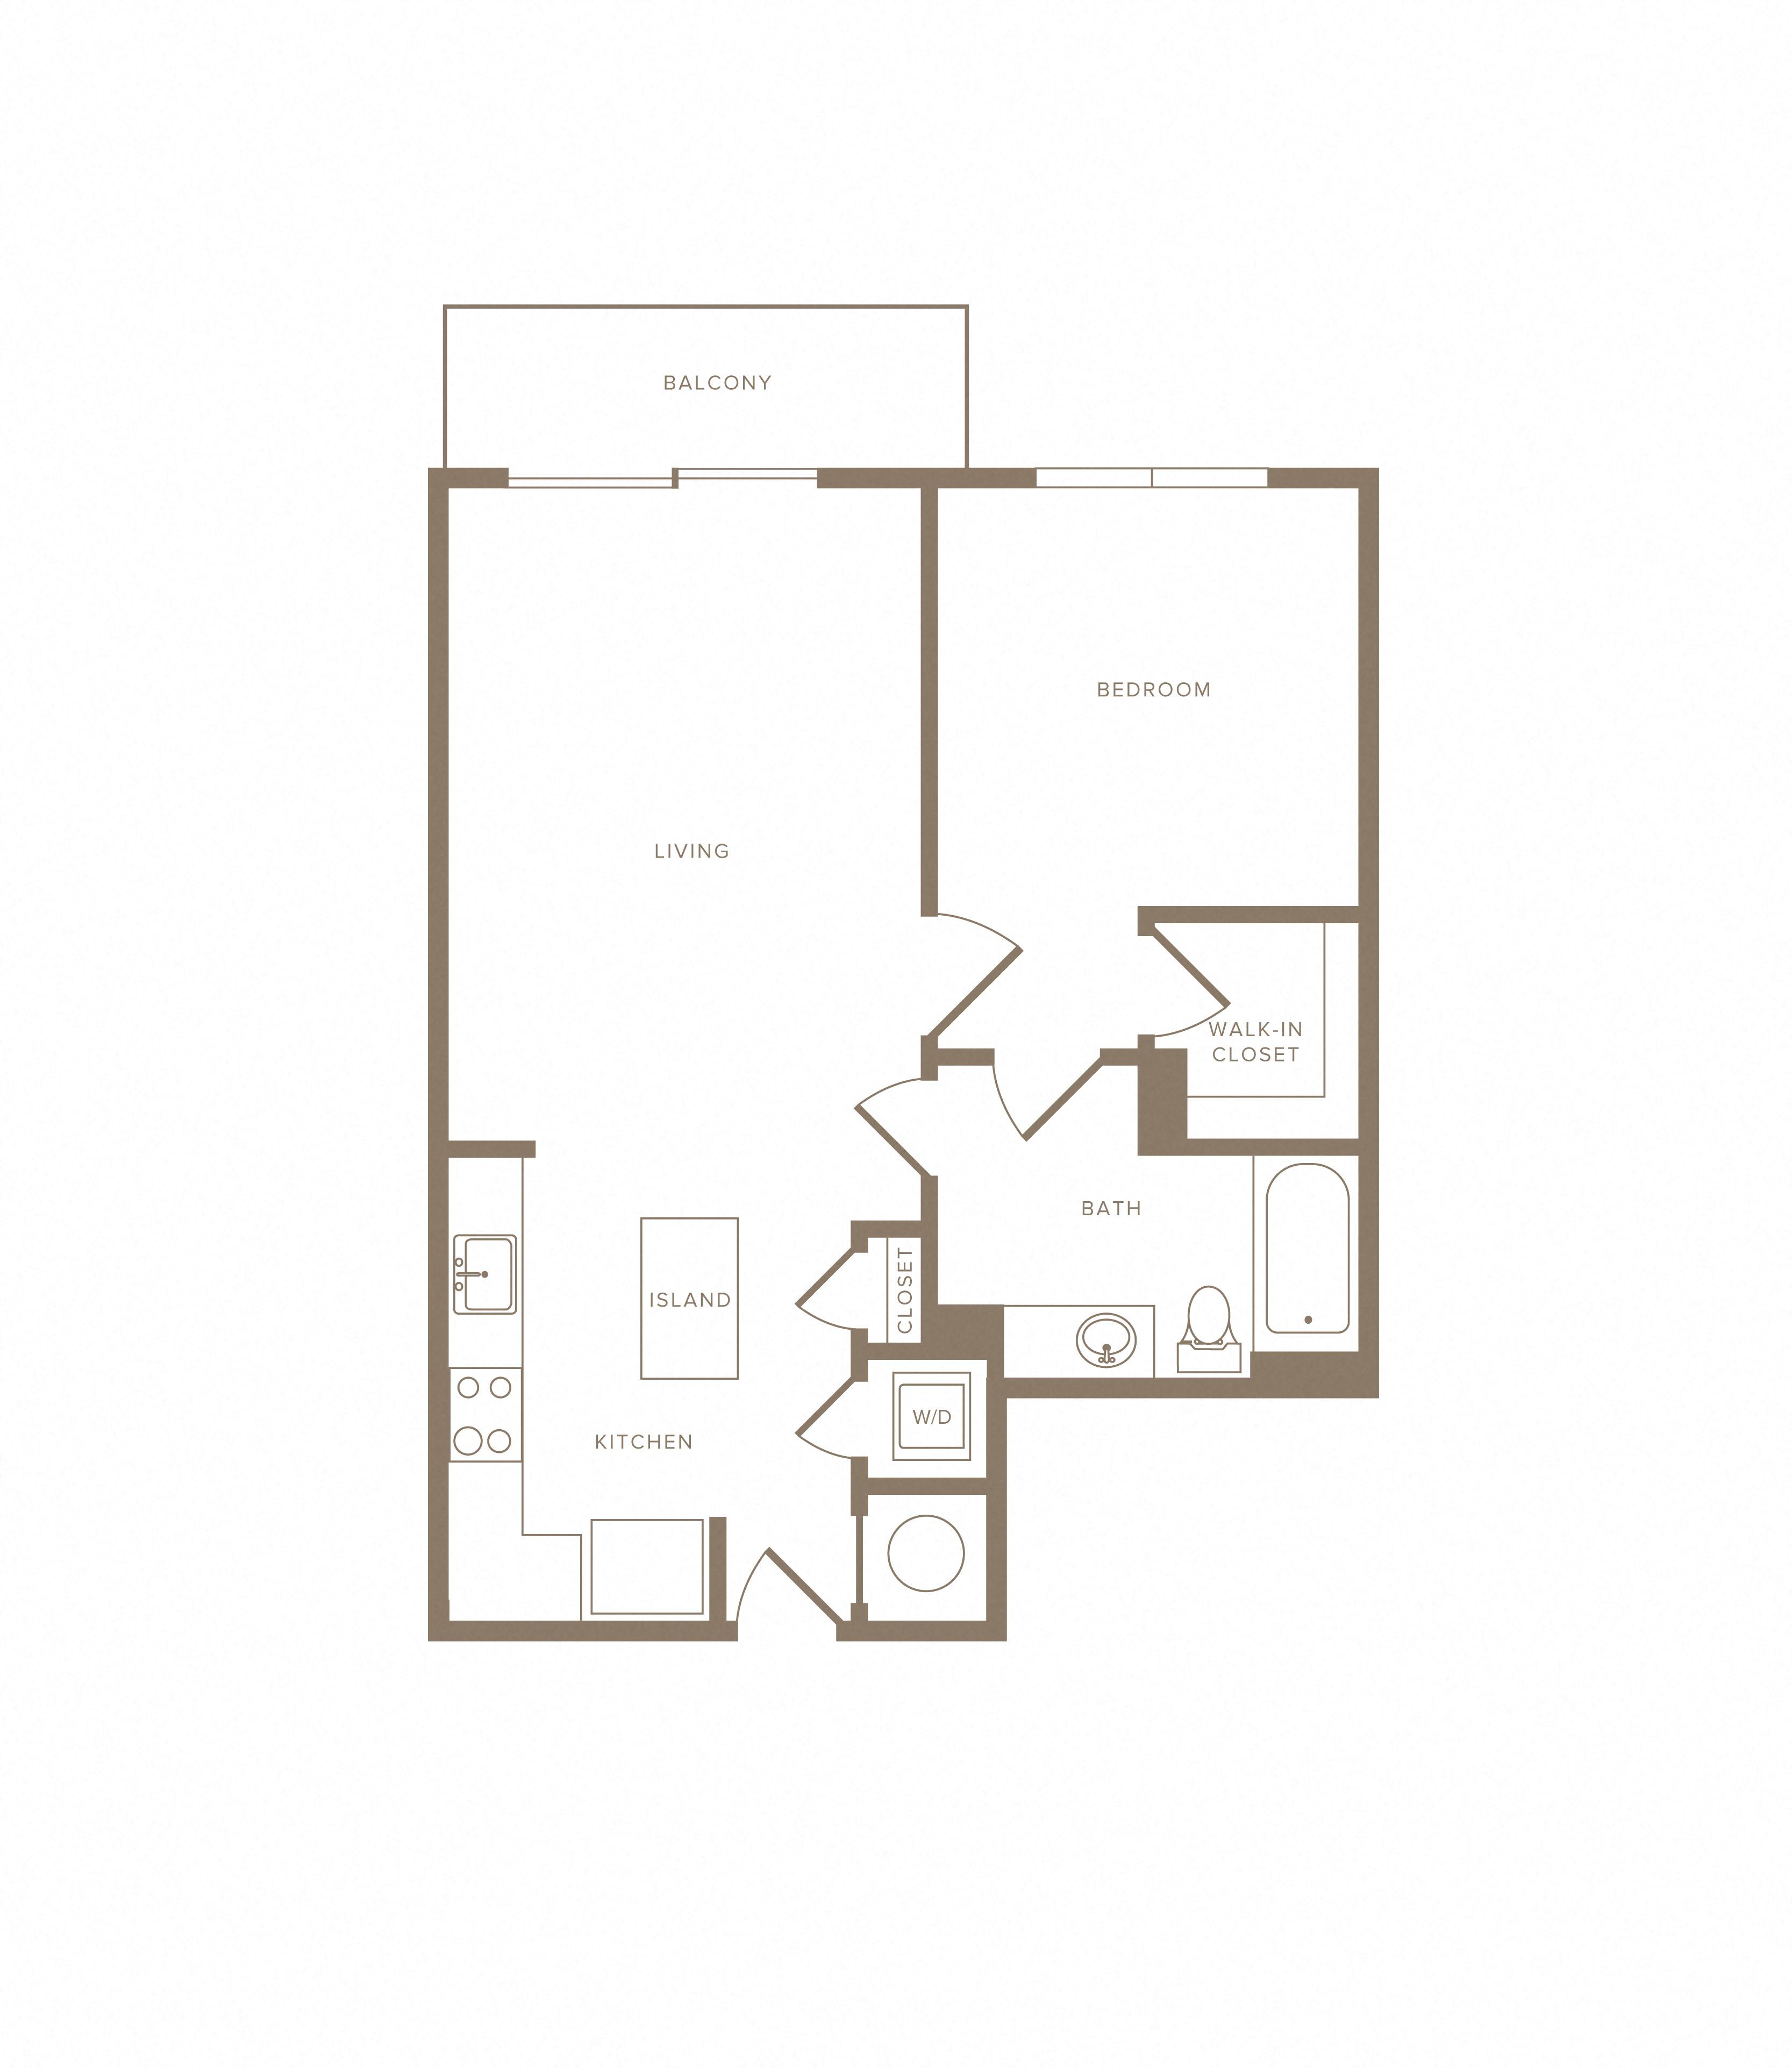 Apartment E-716 floorplan